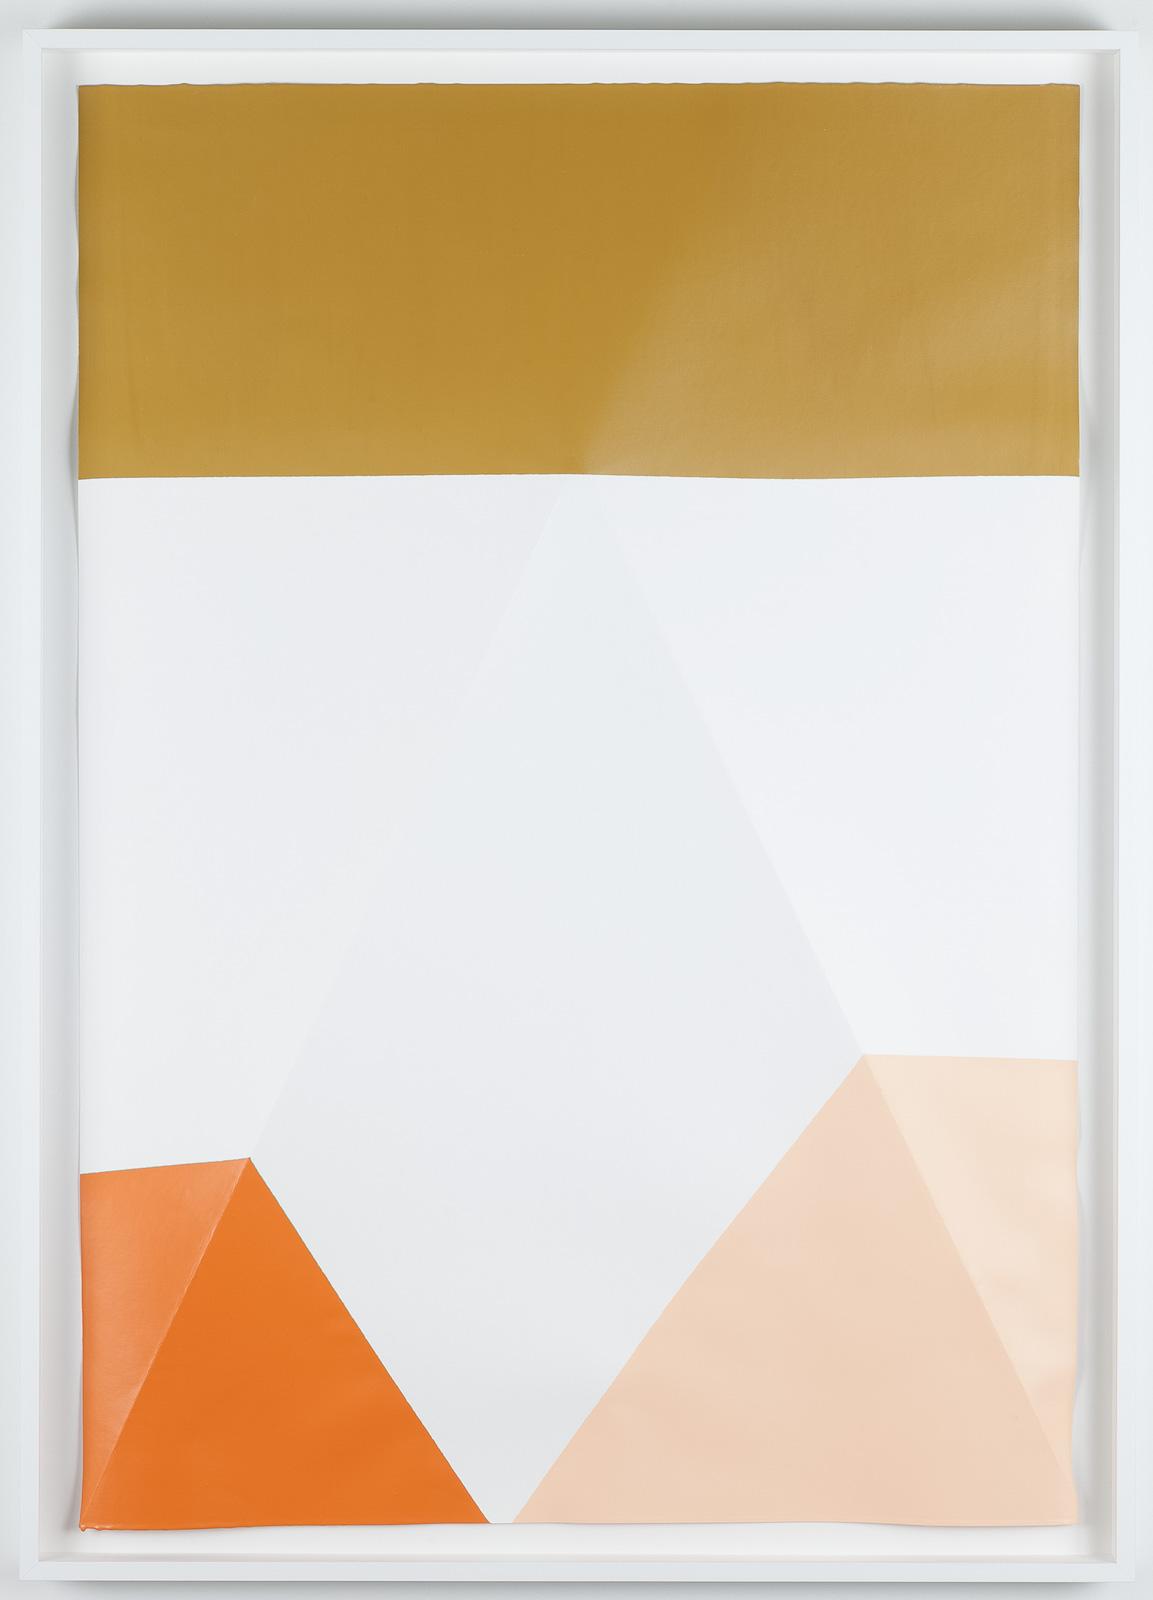 Dip / 5, 2017, Acrylic on paper, 107 x 77 x 5,2 cm